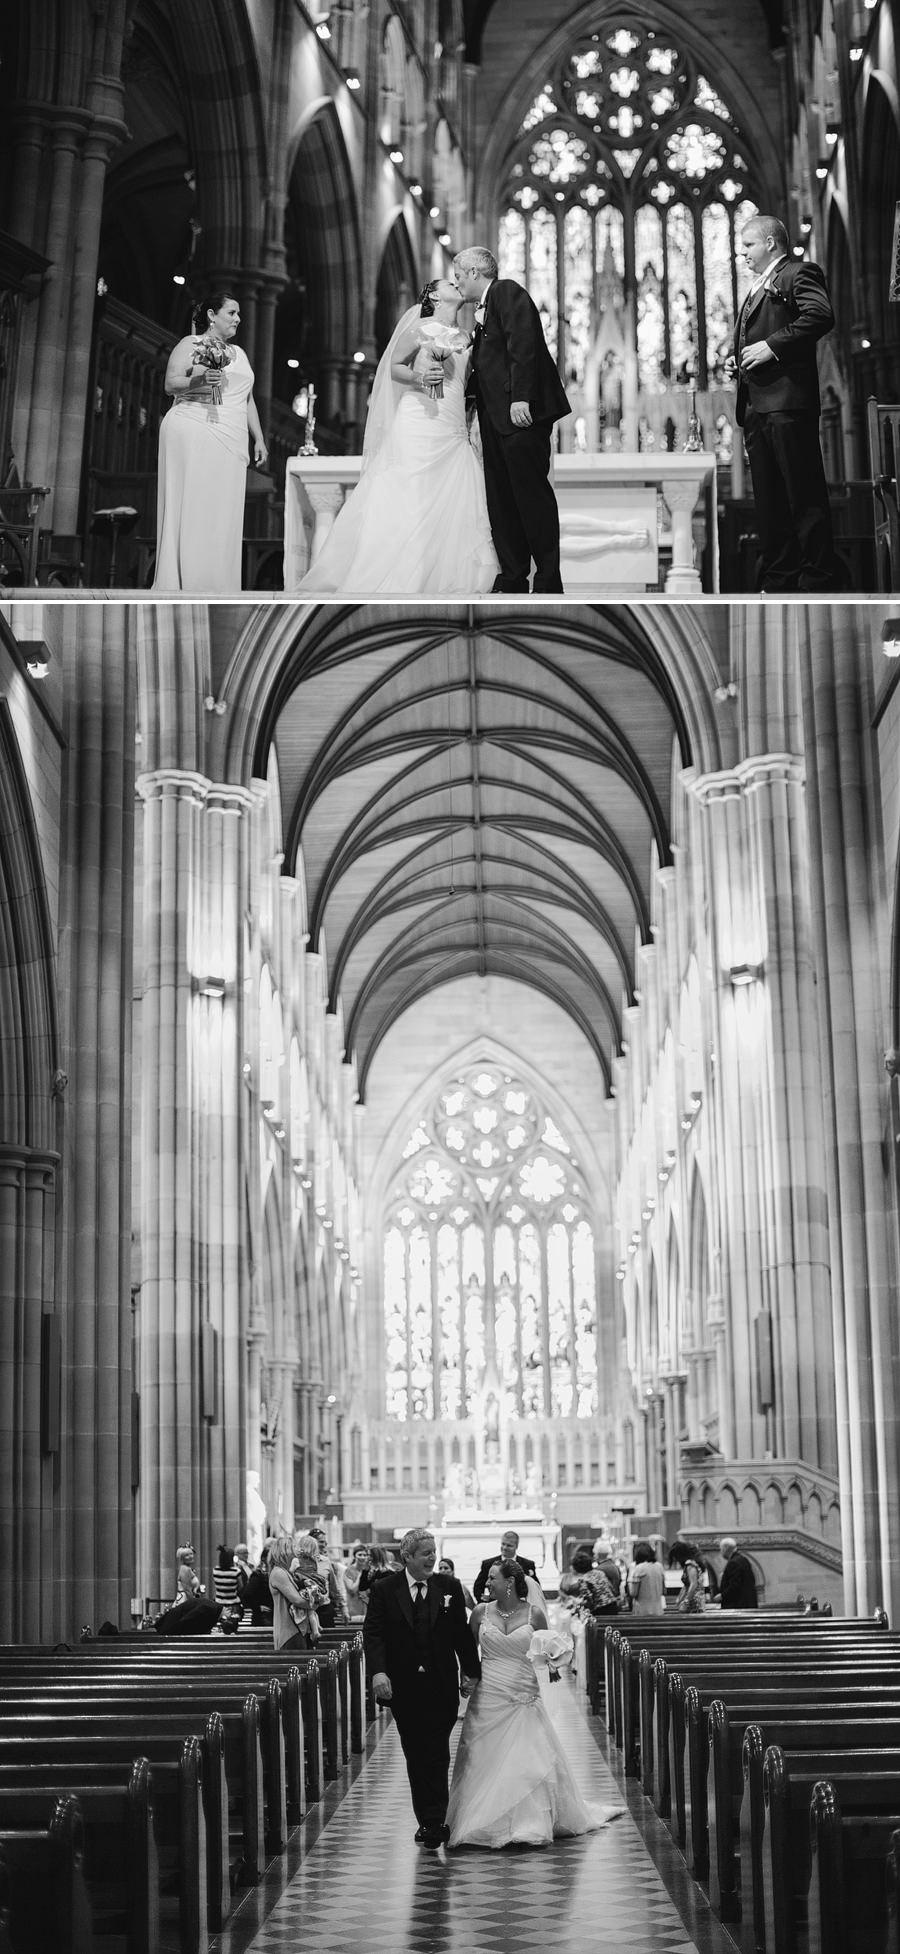 St Marys Wedding Photography: Bride & groom first kiss